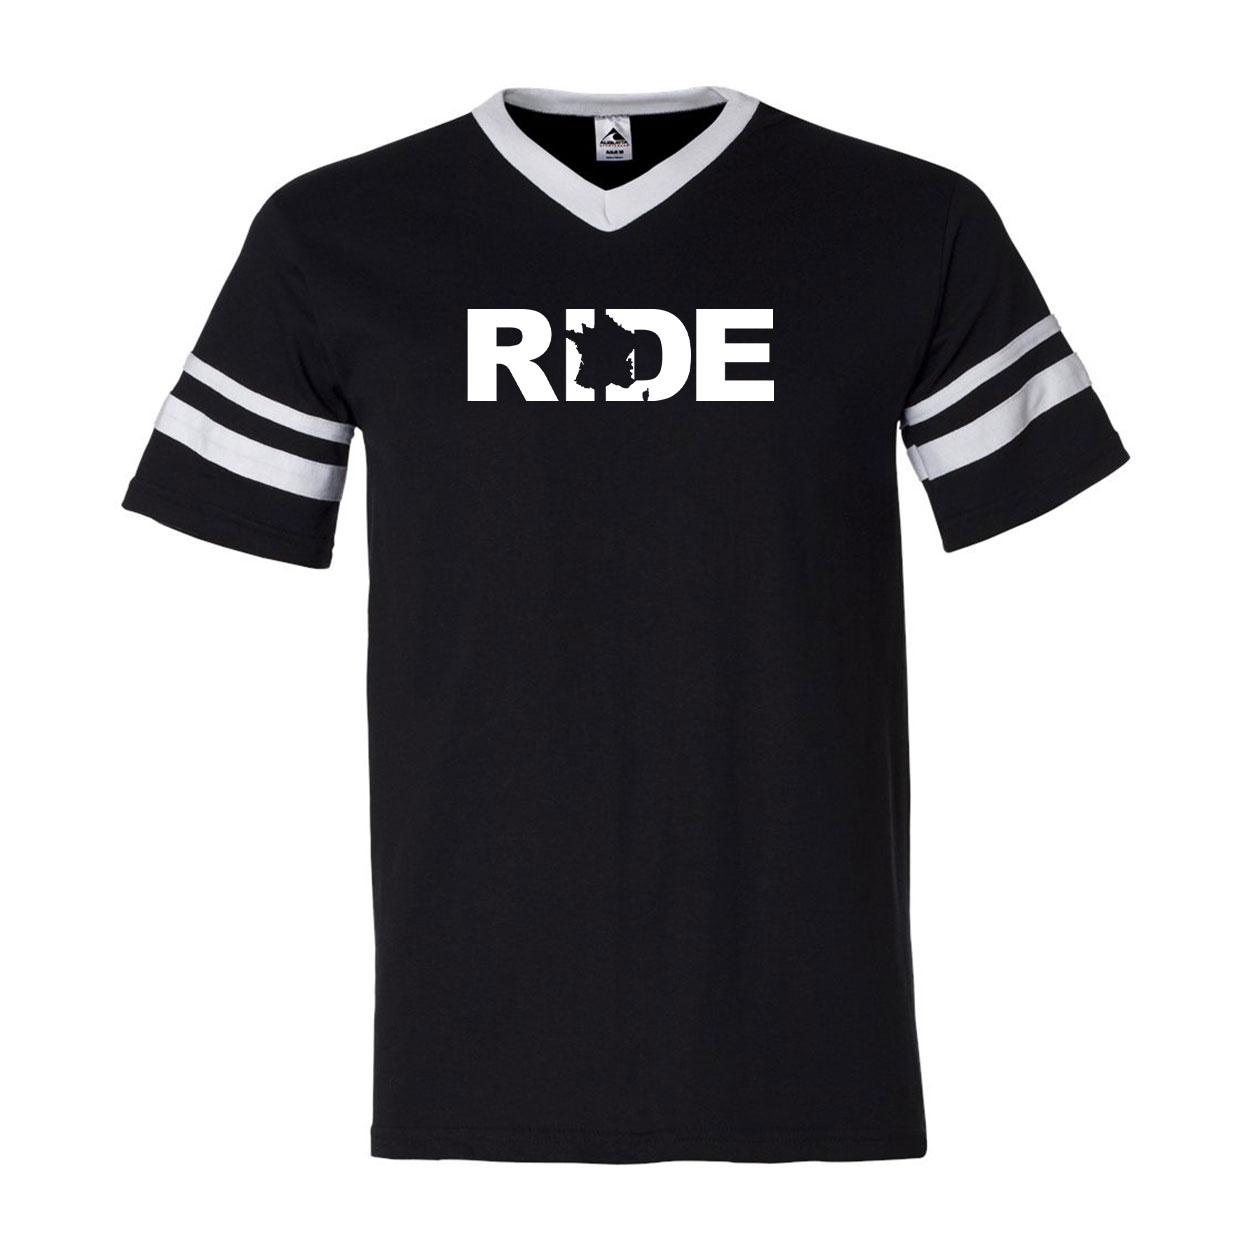 Ride France Classic Premium Striped Jersey T-Shirt Black/White (White Logo)